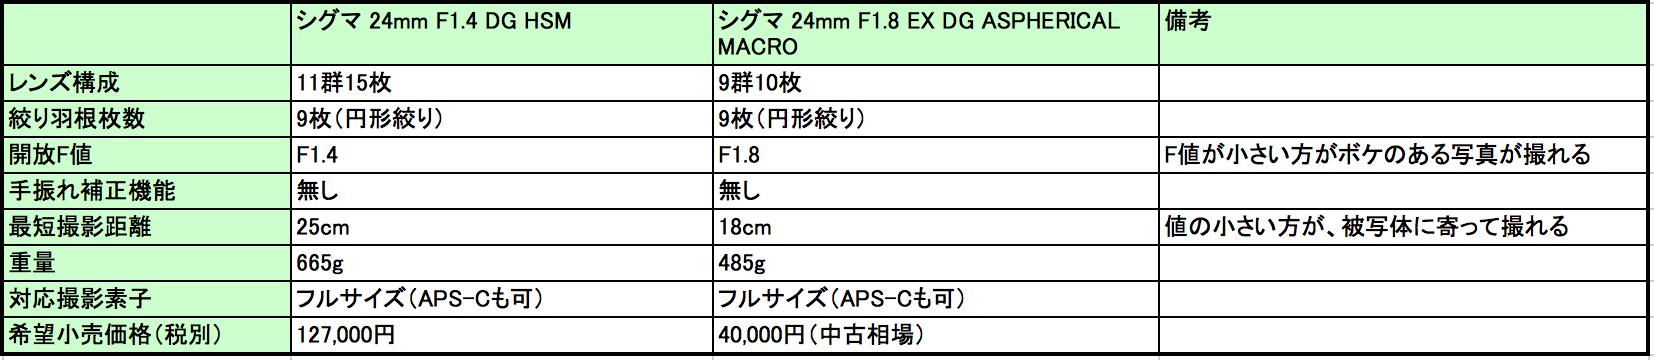 24mm F1.4 vs 24mm F1.8